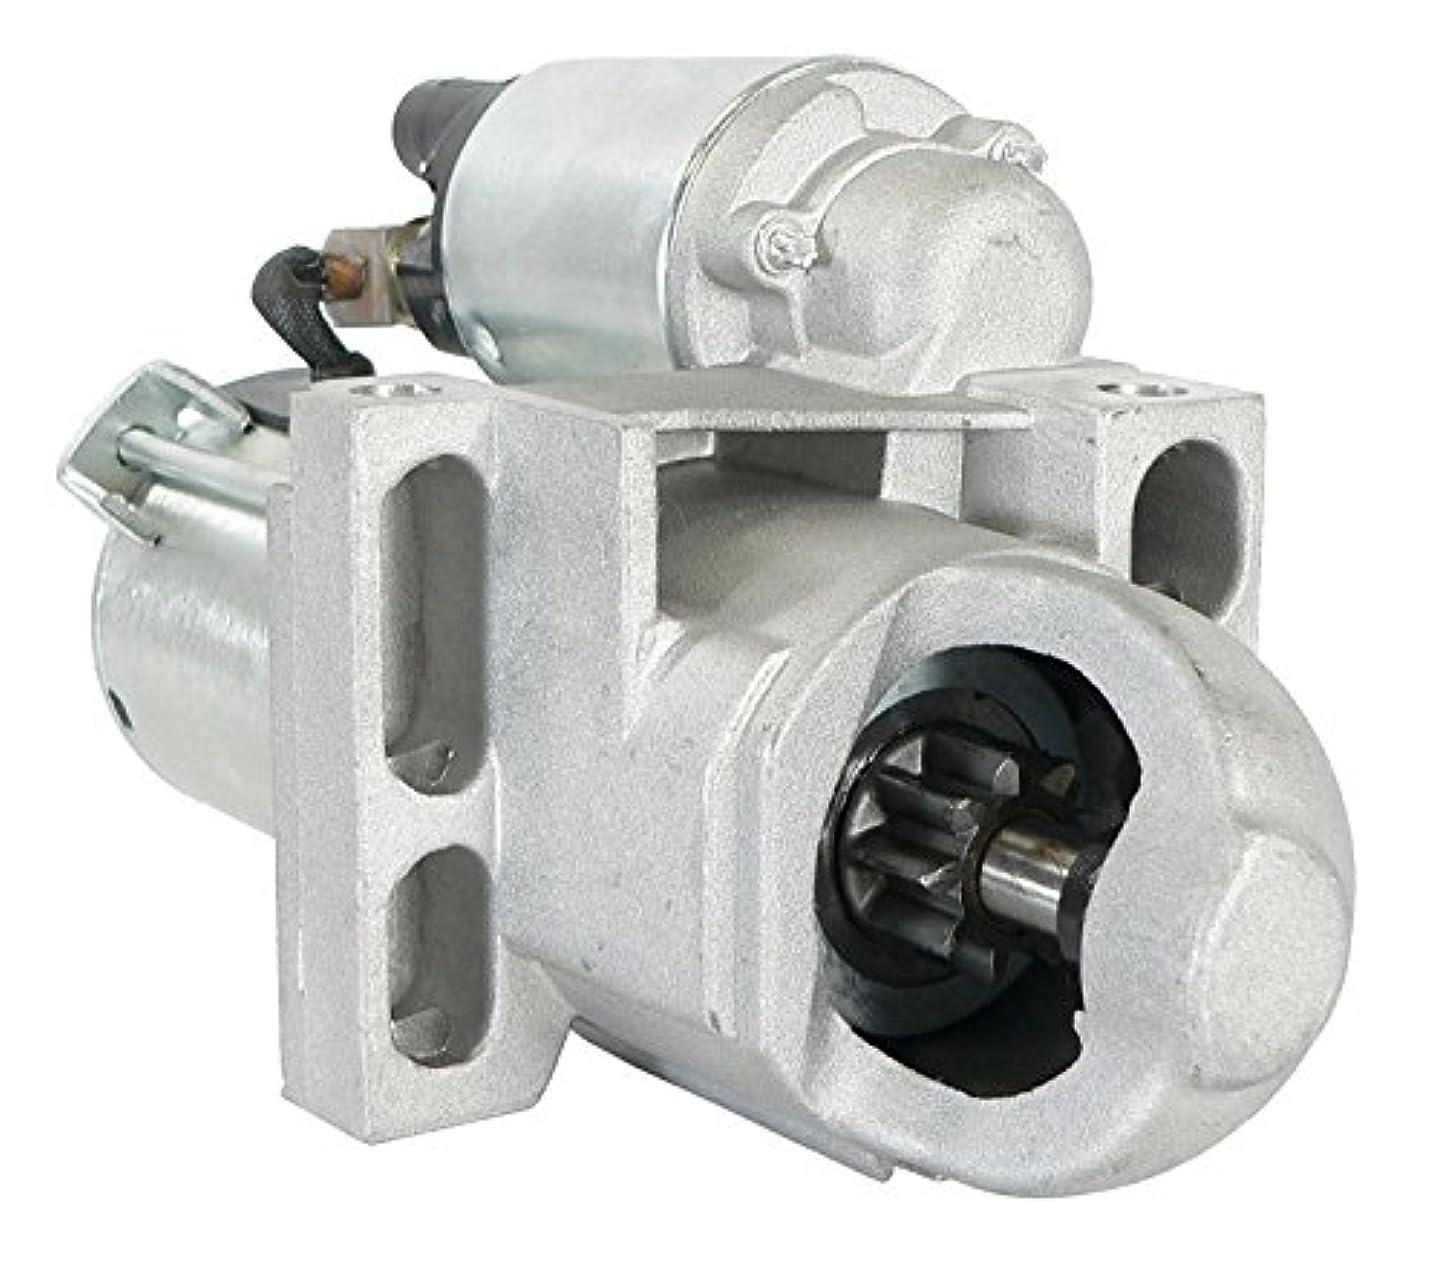 DB Electrical SDR0381 Starter For 4.3 4.3L Chevrolet GMC Silverado & Sierra 1500 Pickup 09 10 11 12 13 / Express & Savana Van 2008-2014/12611101, 19168040, 19180530 8000214, 8000293